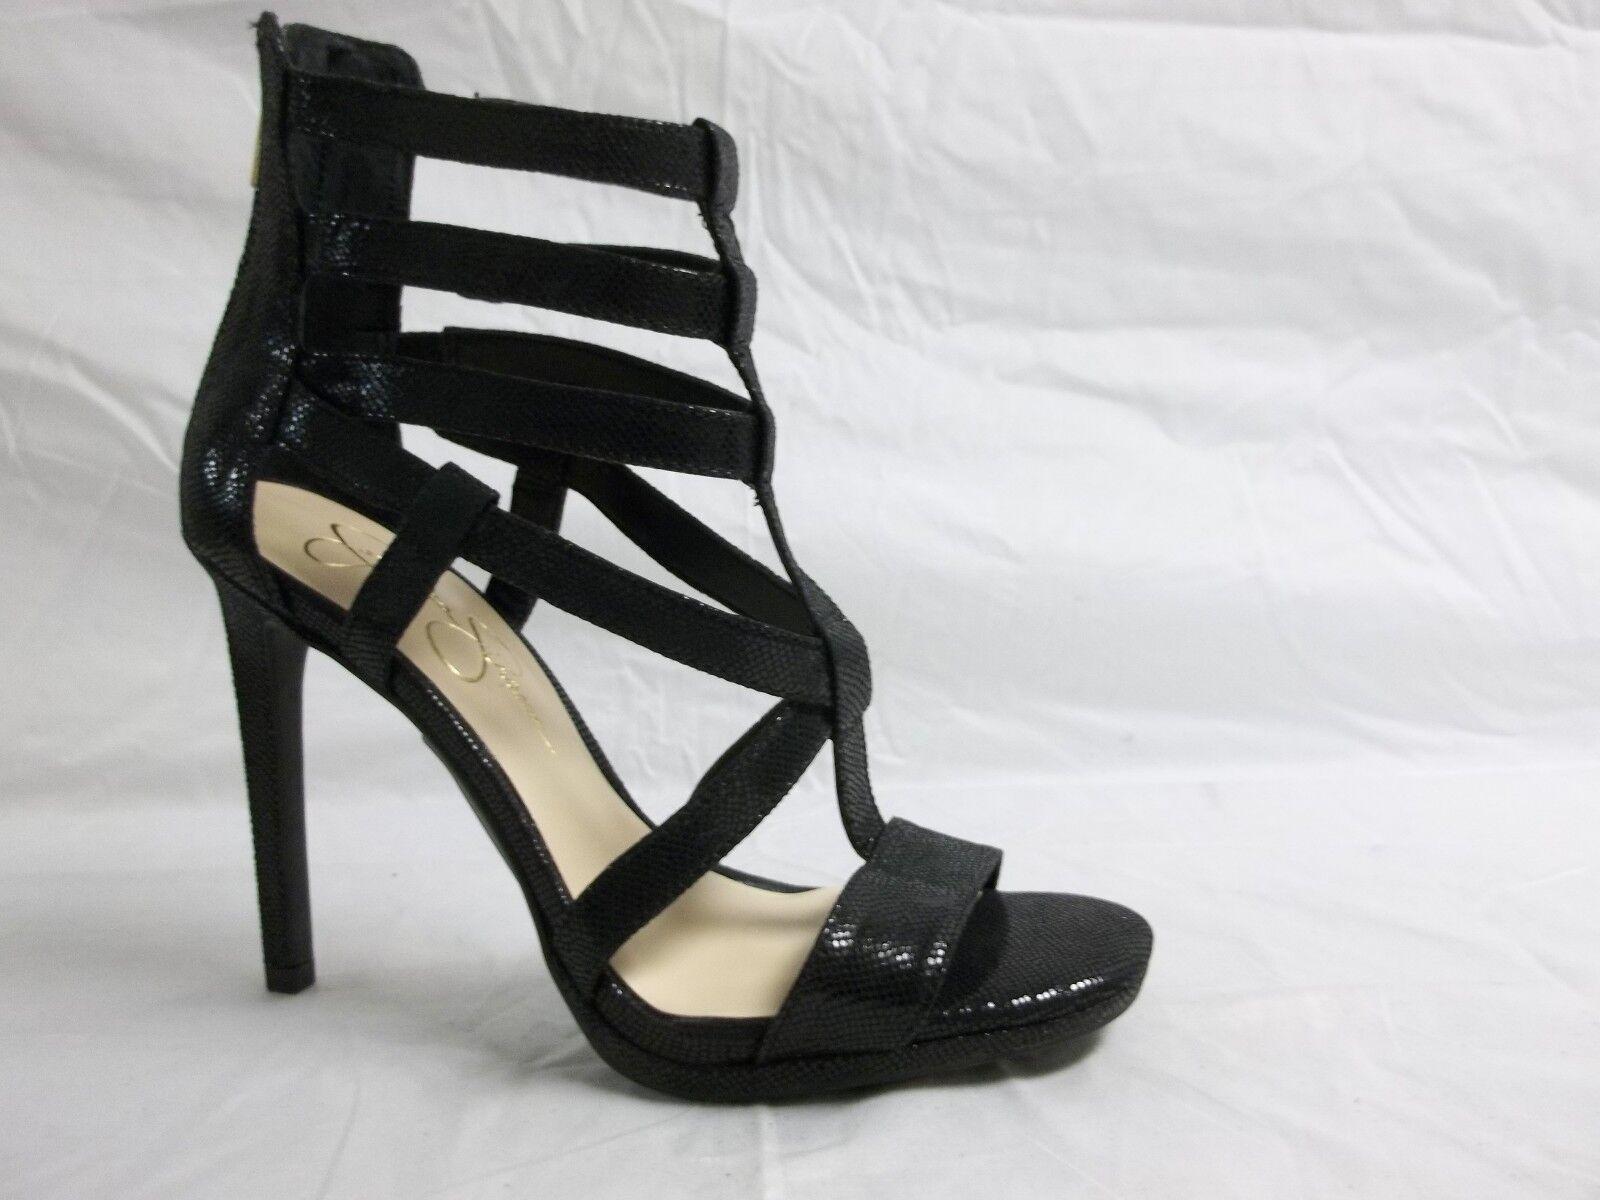 Jessica Simpson Size 6.5 M Marthena Nero New Open Toe Heels New Nero Donna Shoes NWOB 46672f